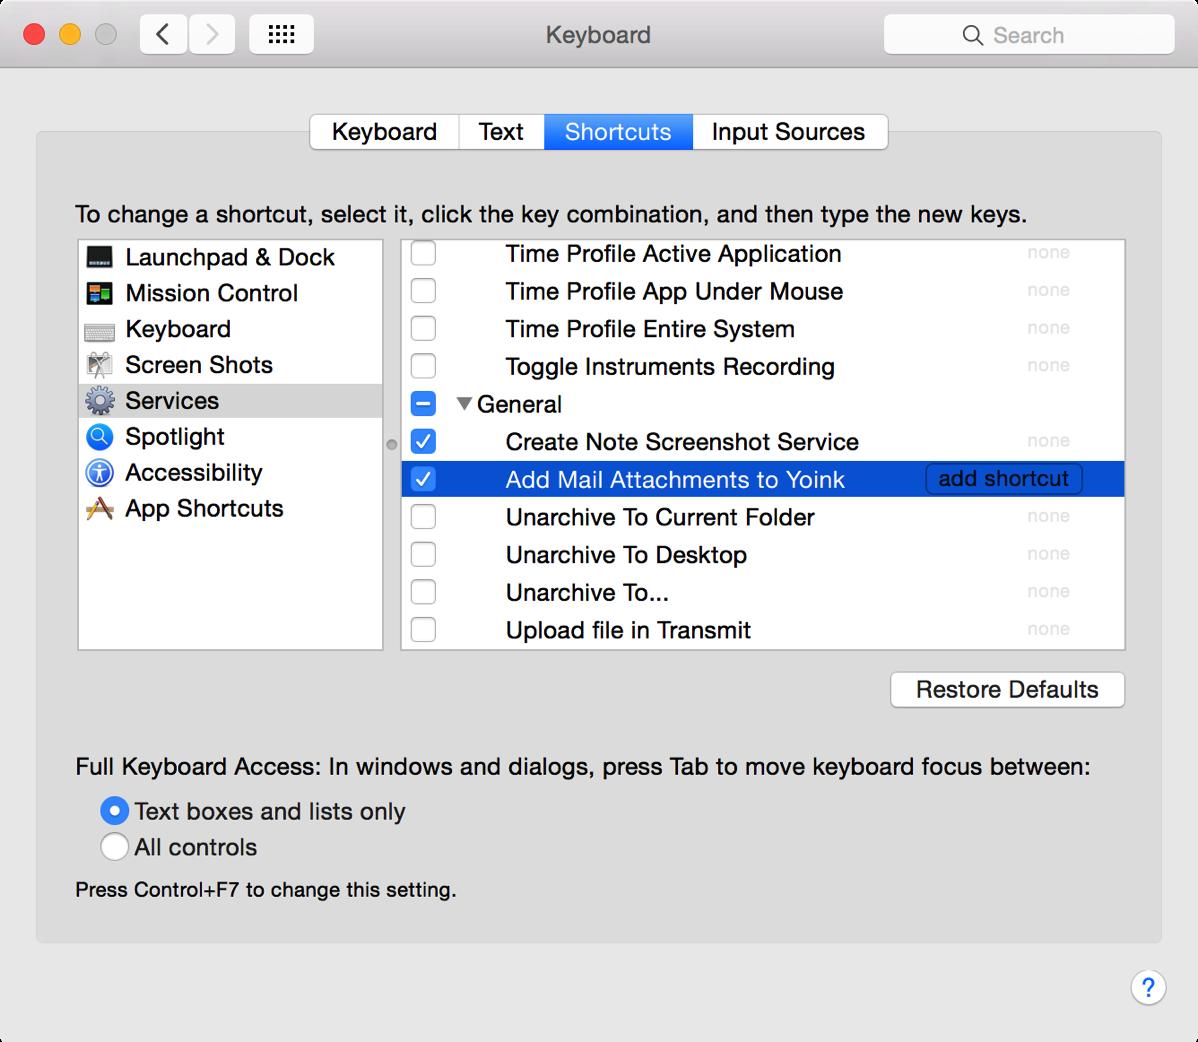 Service - Keyboard Shortcut